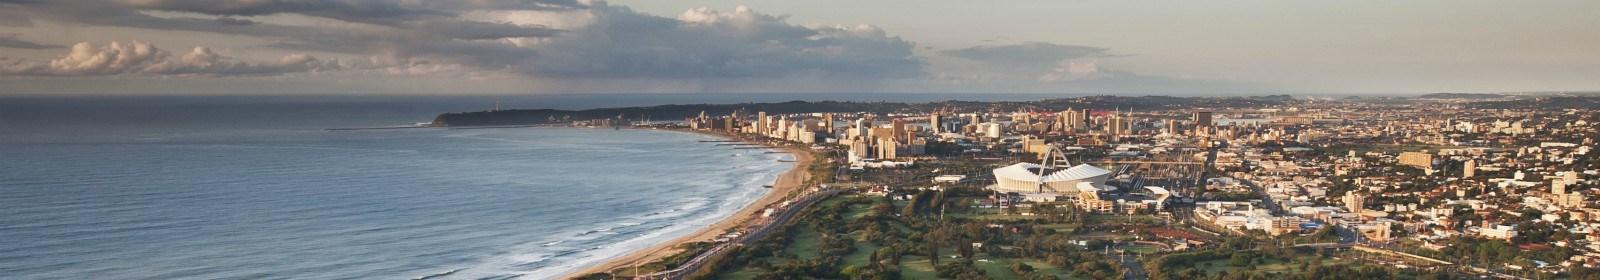 Renewed life for Durban property market